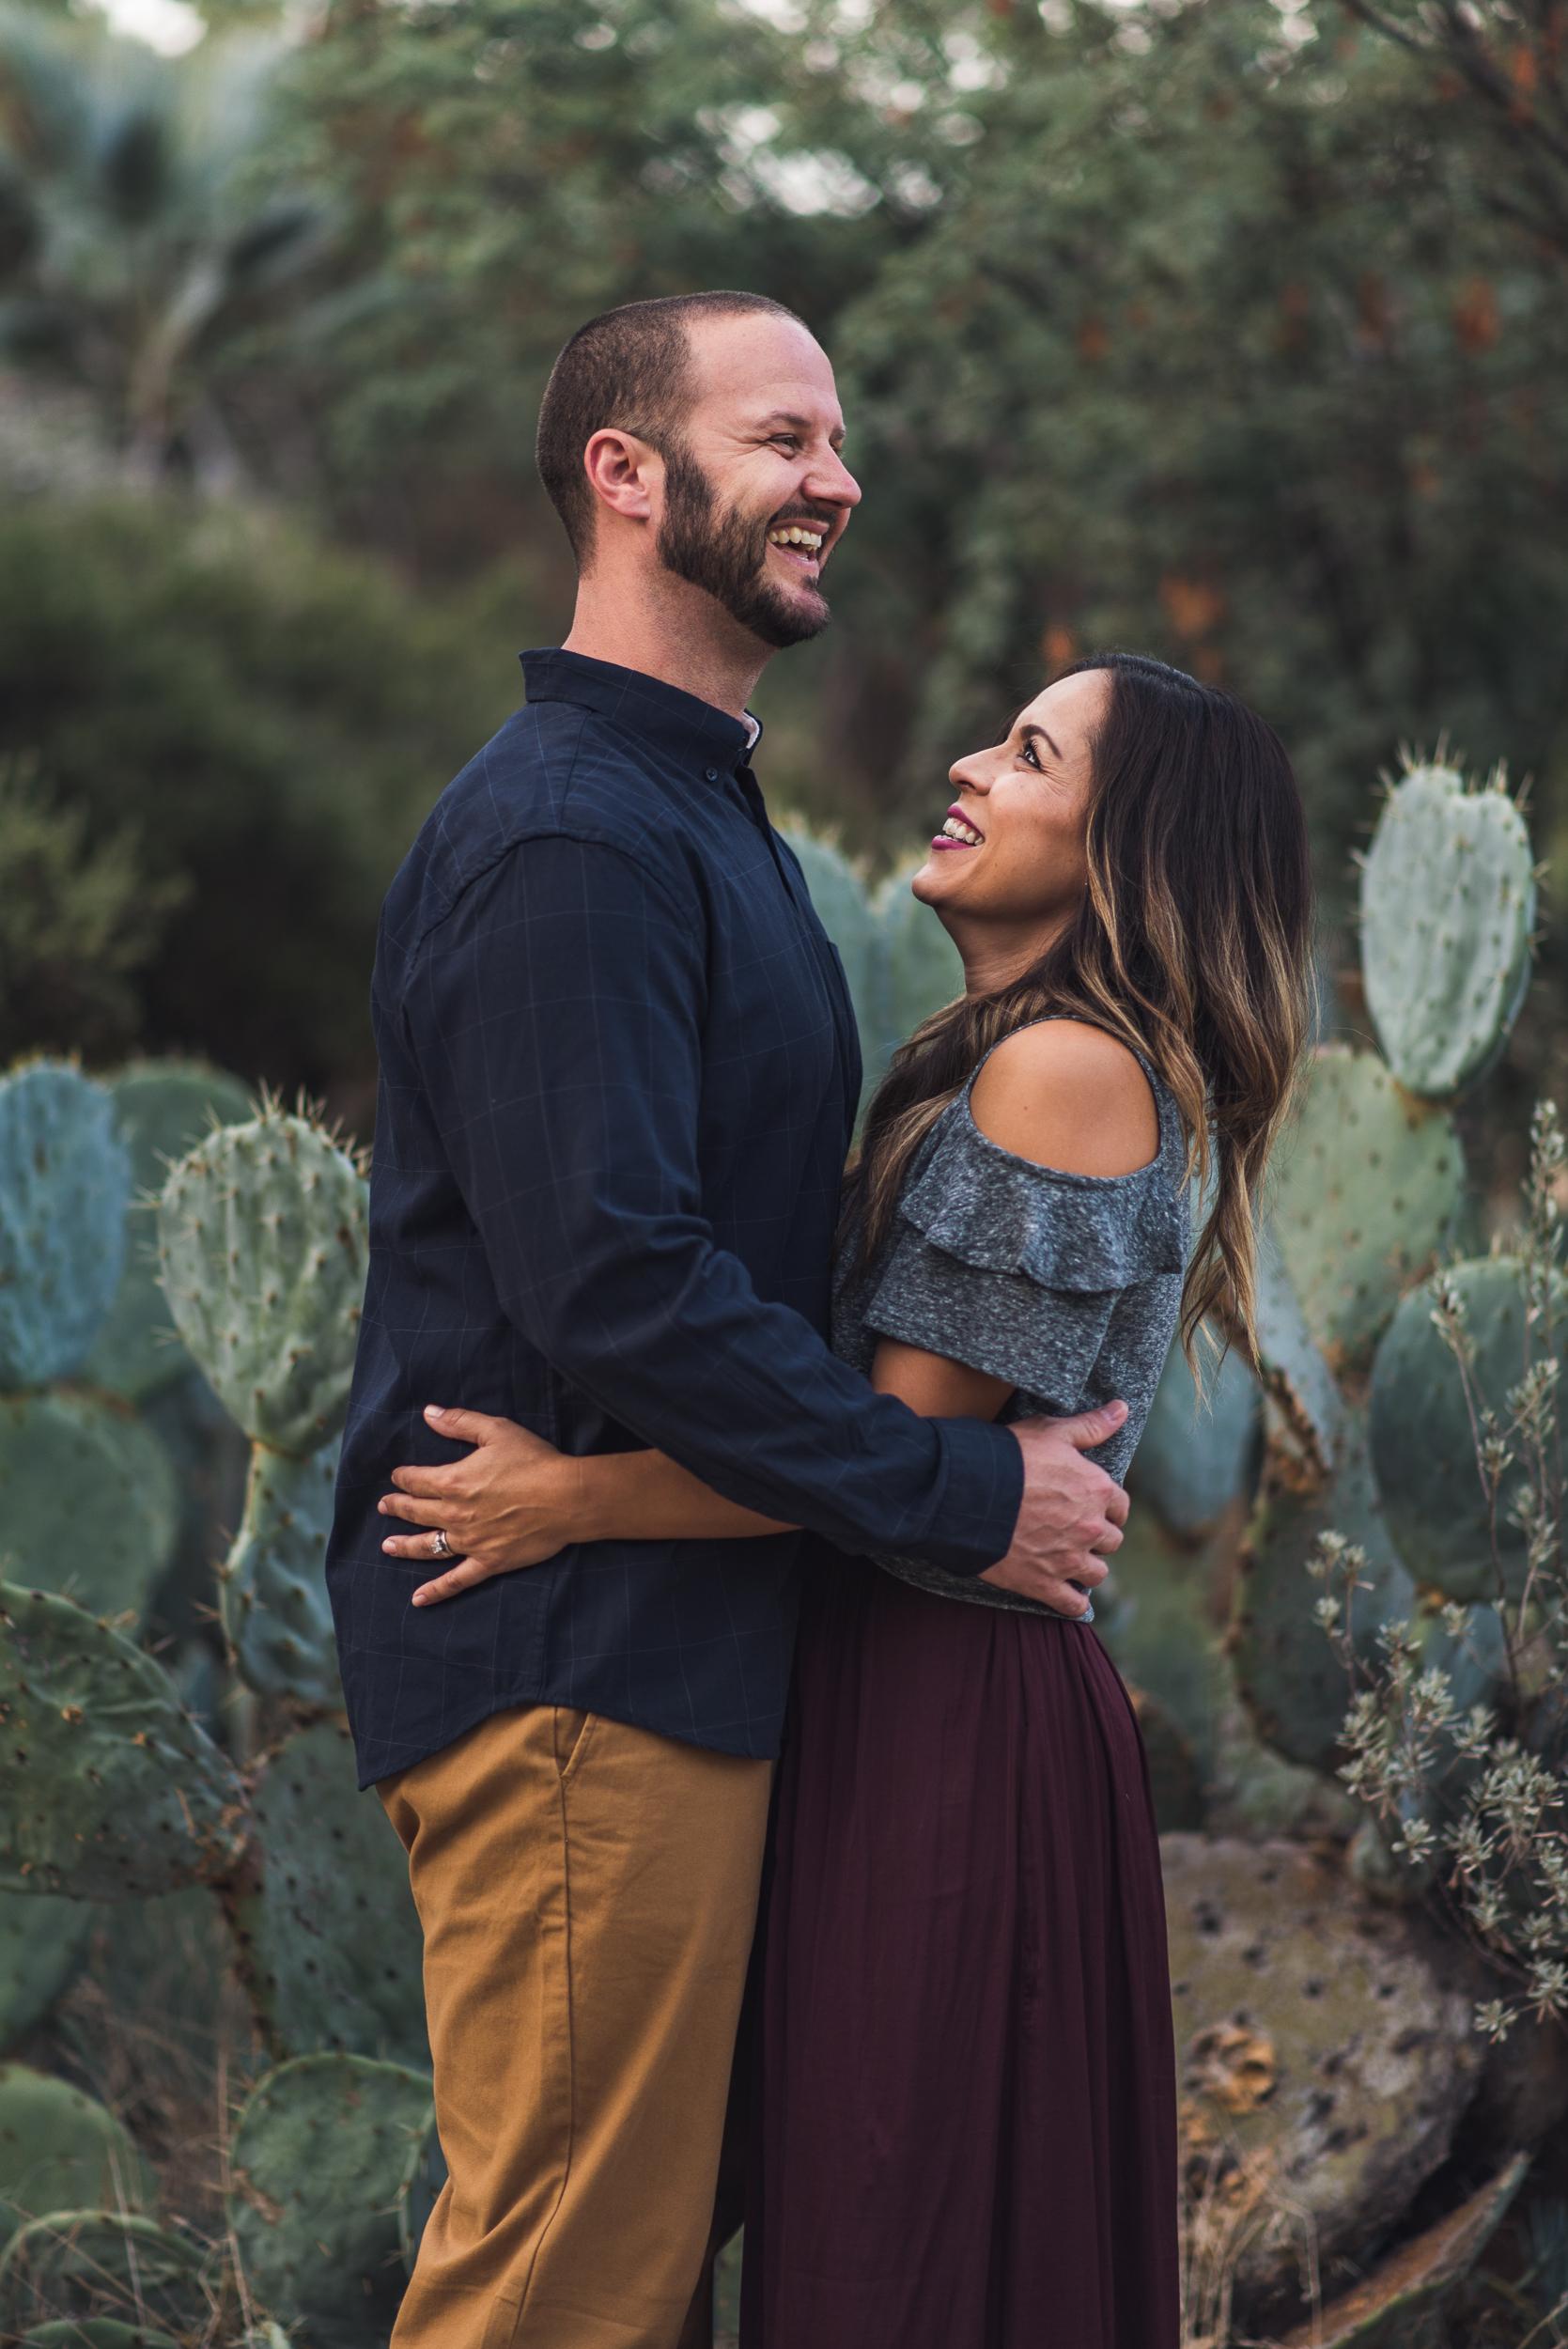 2018-San-Diego-Family-Lifestyle-Newborn-Travel-Vacation-Photographer-Kelsey-Smith-Photography-Coronado-La-Jolla-Encinitas-Solana-Beach-Del-Mar-108.jpg